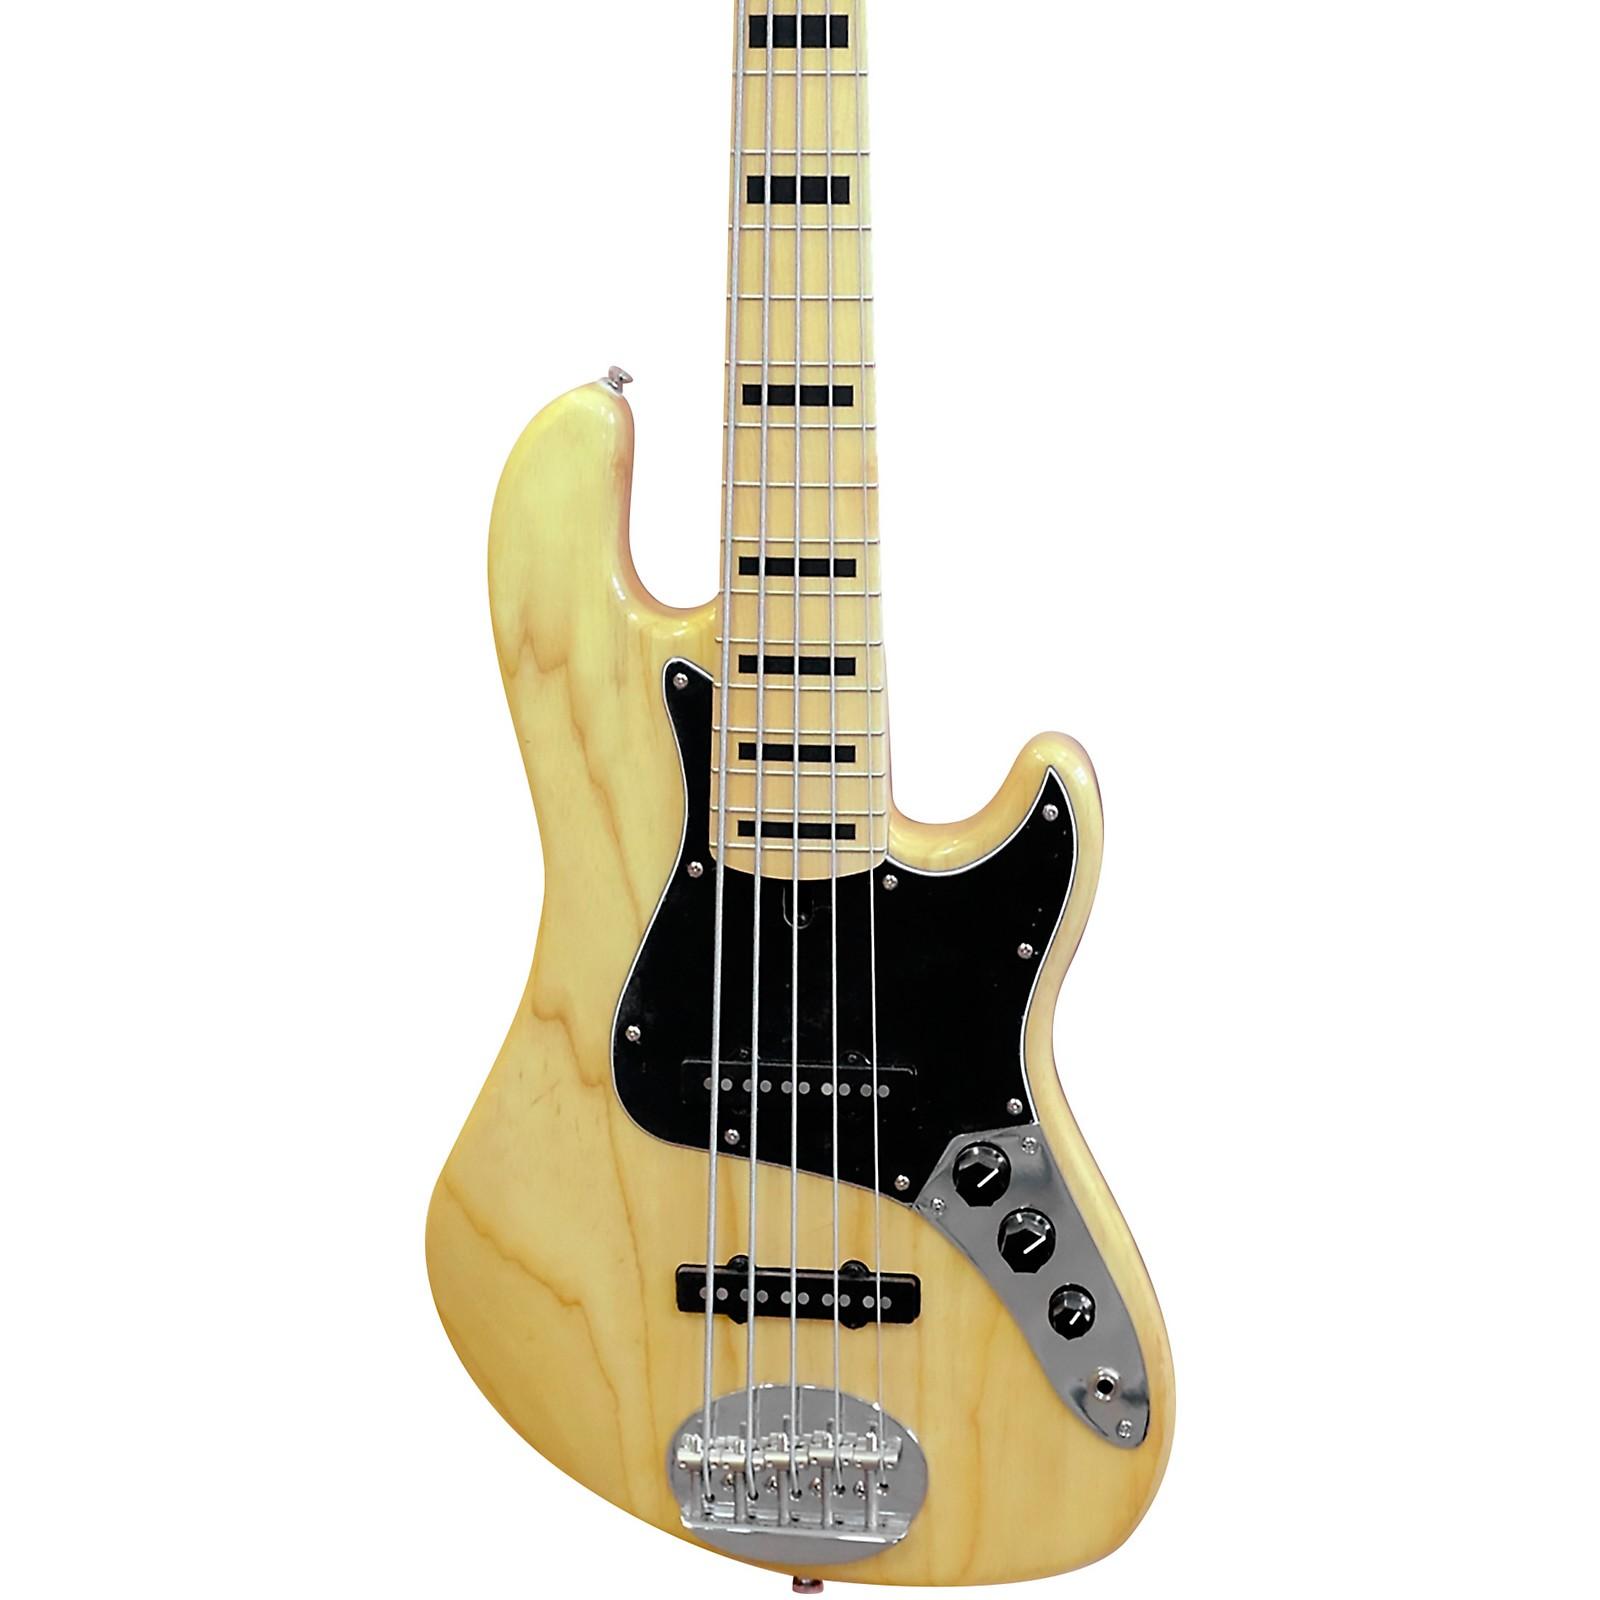 Open Box Lakland Darryl Jones Signature Model 5-String Maple Fretboard Electric Bass Guitar